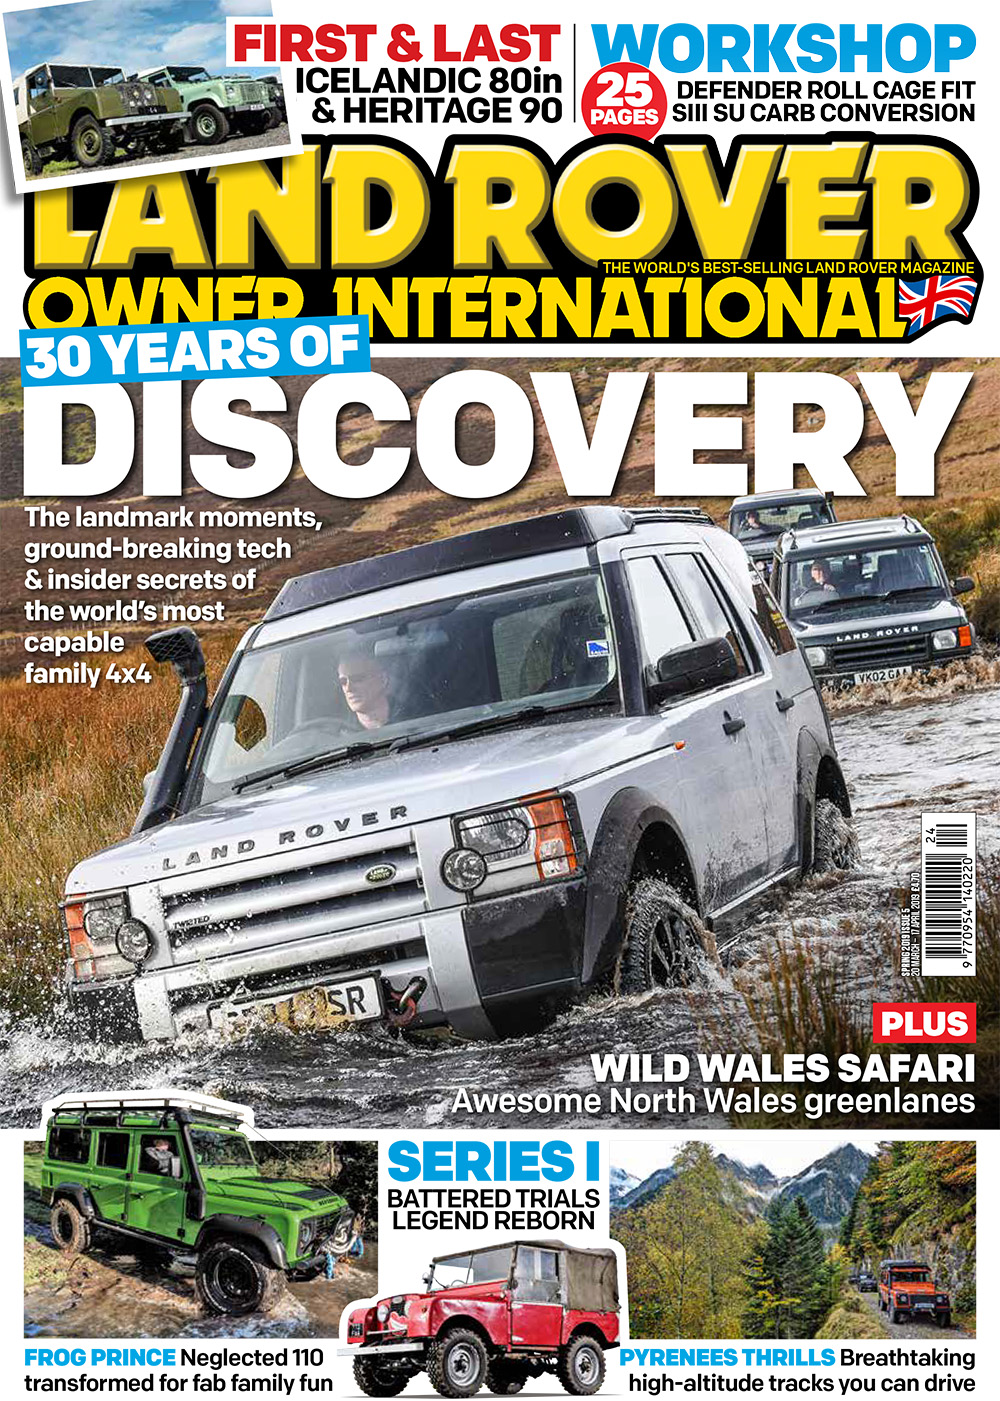 Land Rover Owner magazine Spring 2019 cover